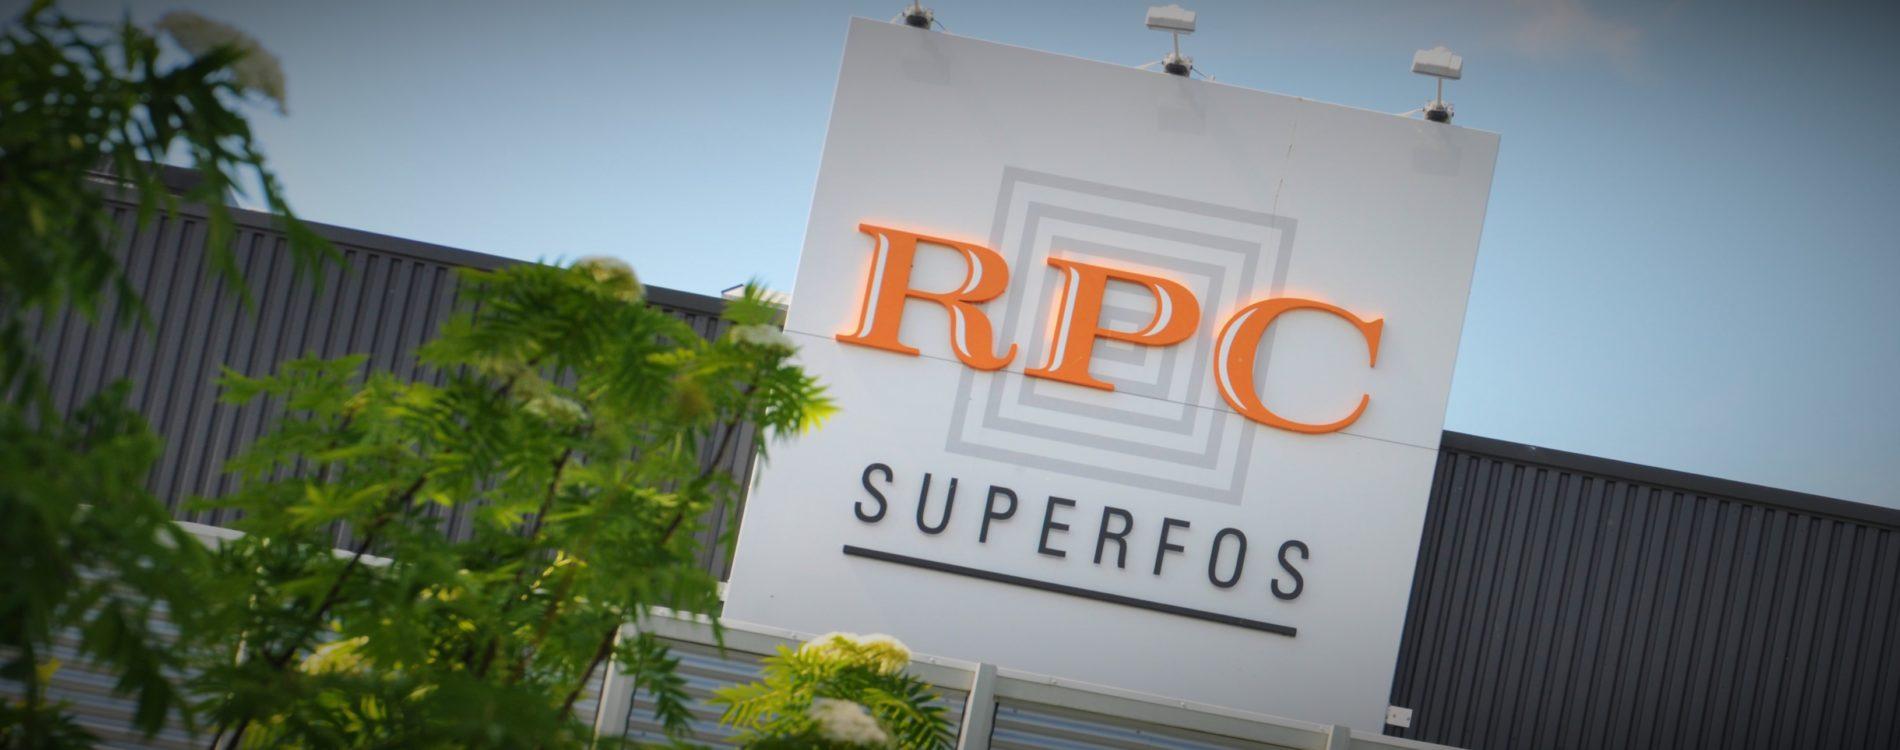 RPC Superfos stor logga över entrén